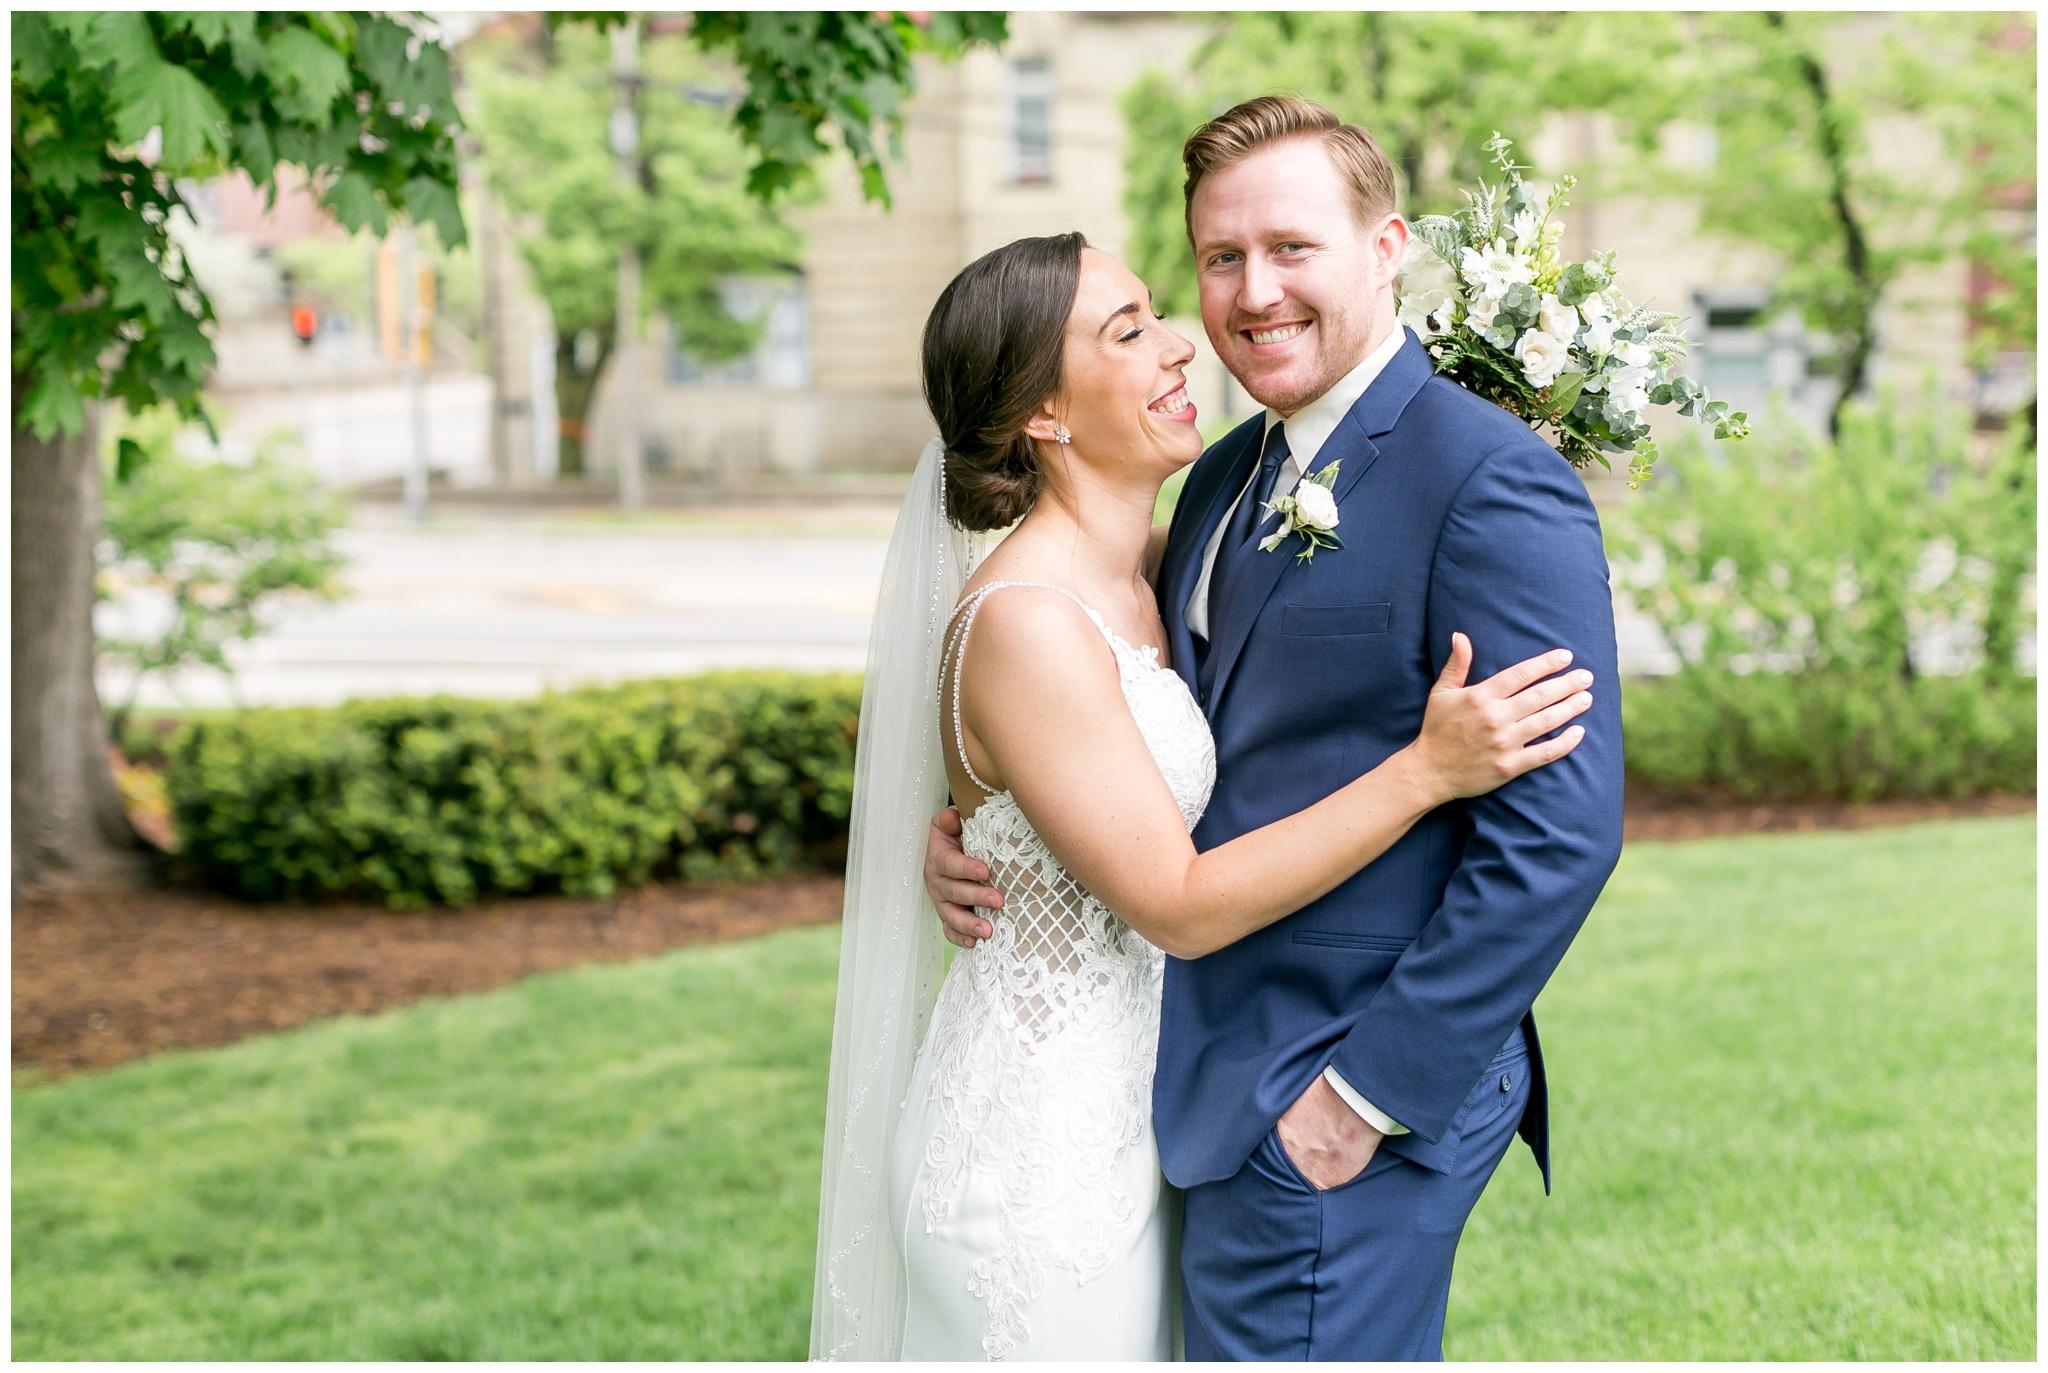 Union_south_Wedding_Madison_Wisconsin_Caynay_Photo_3641.jpg